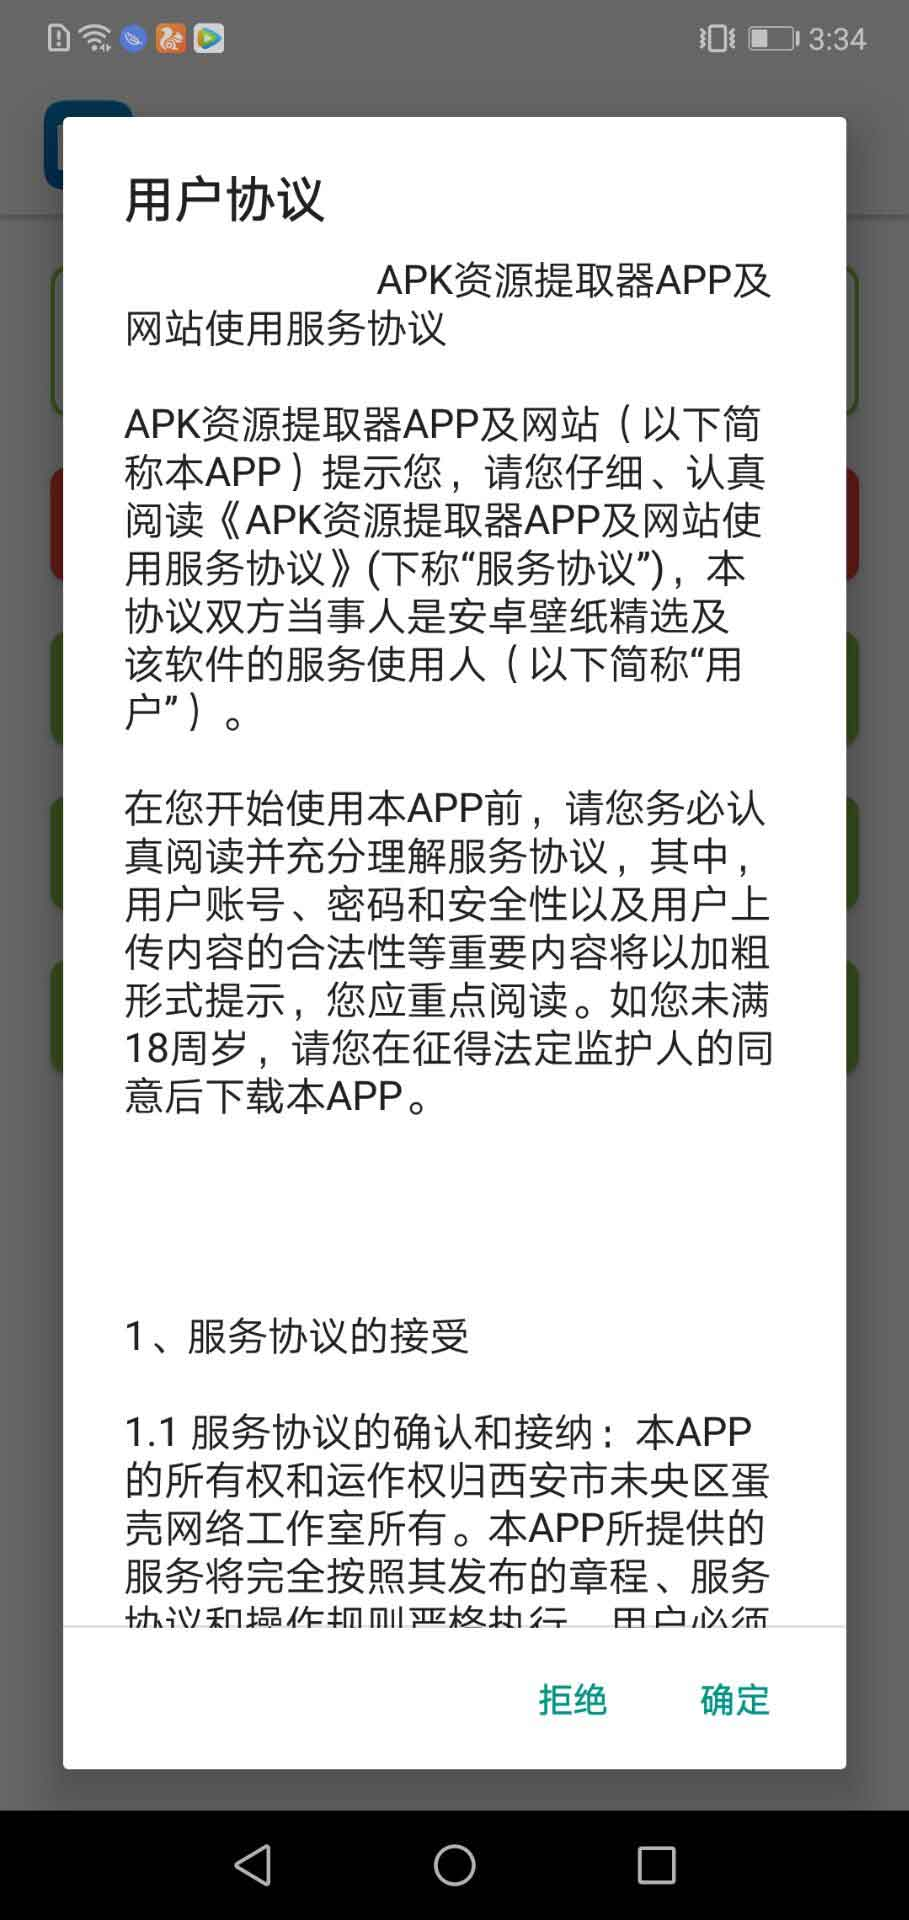 APK资源提取器